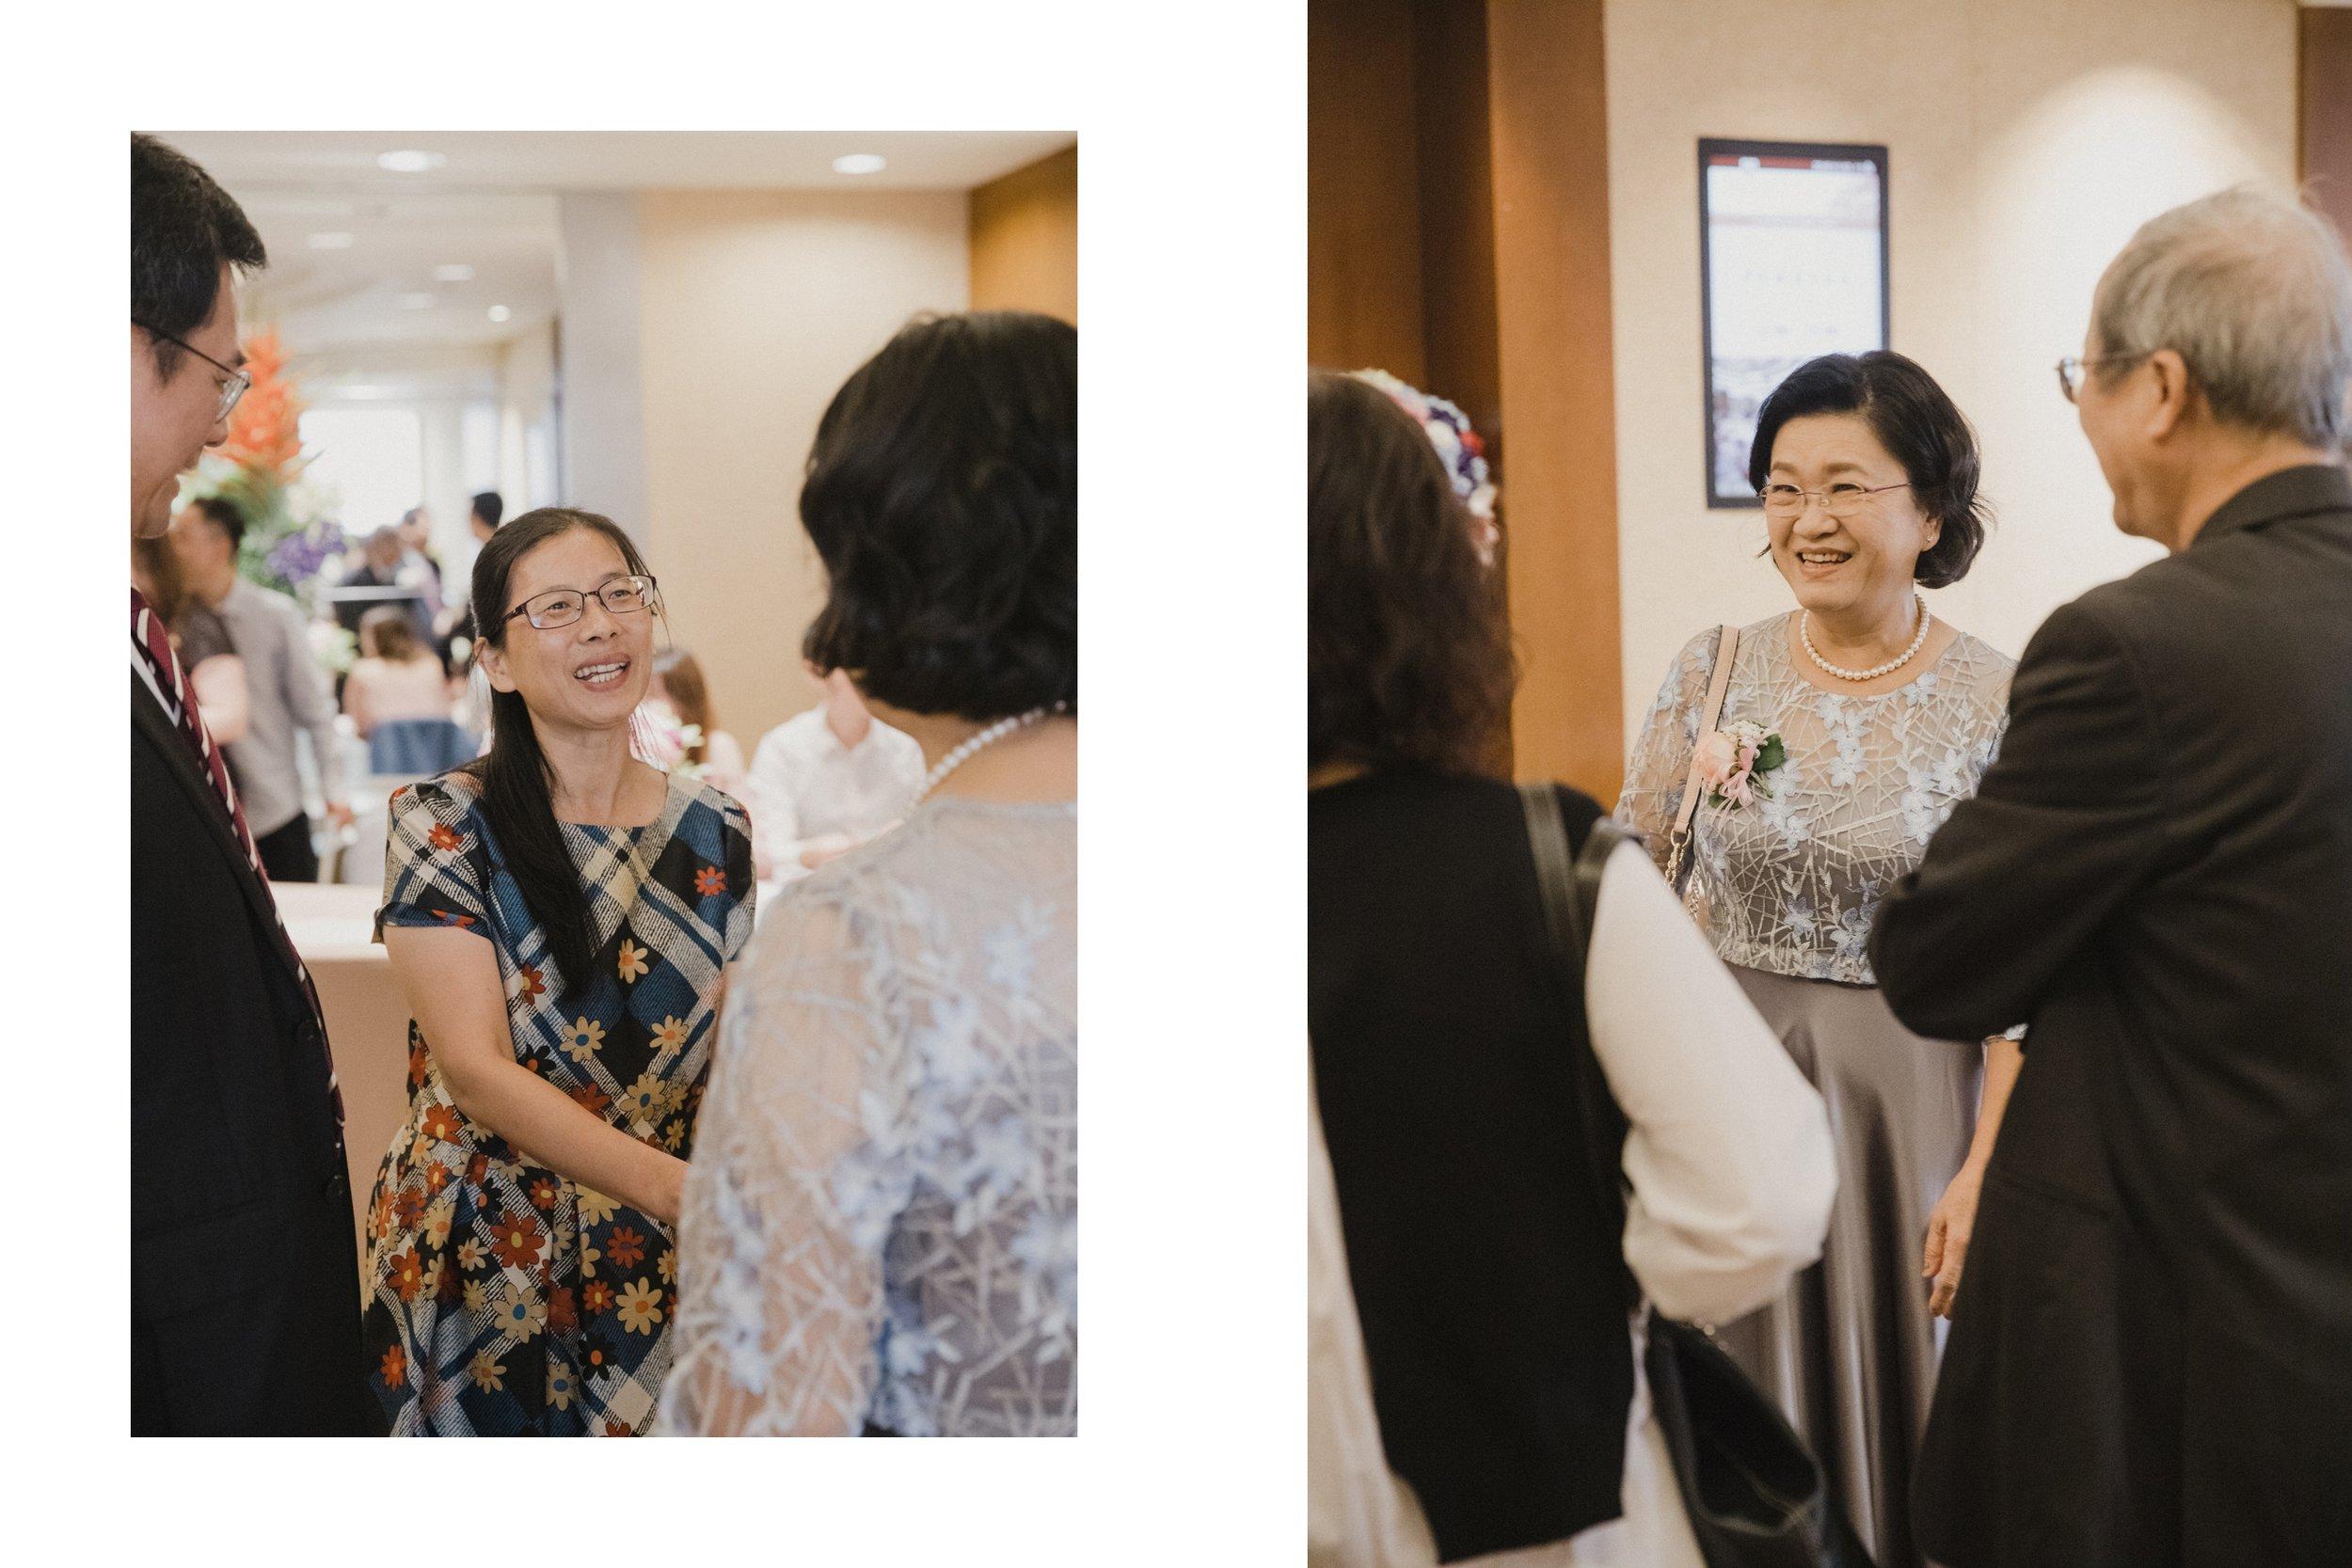 wedding-caridee-oscar-lunch-ambassador-hsinchu-結婚午宴-新竹國賓_43.jpg